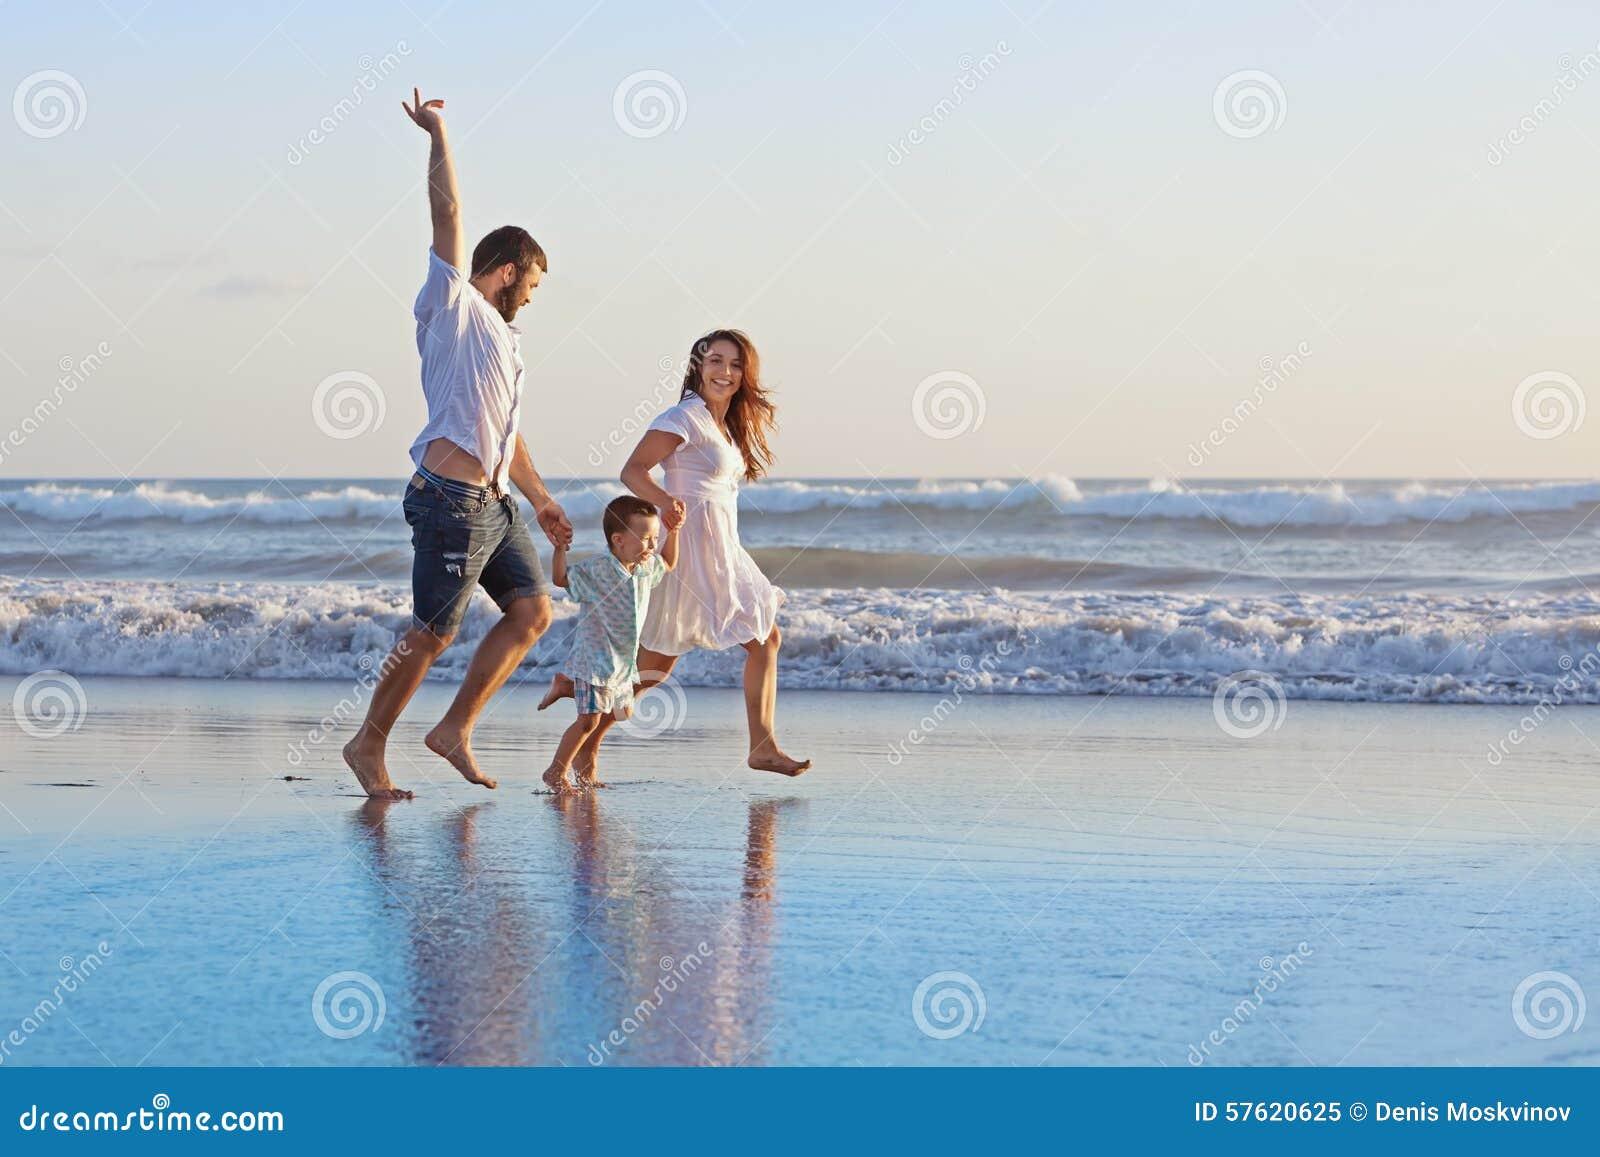 Positive family running along sea edge on the beach